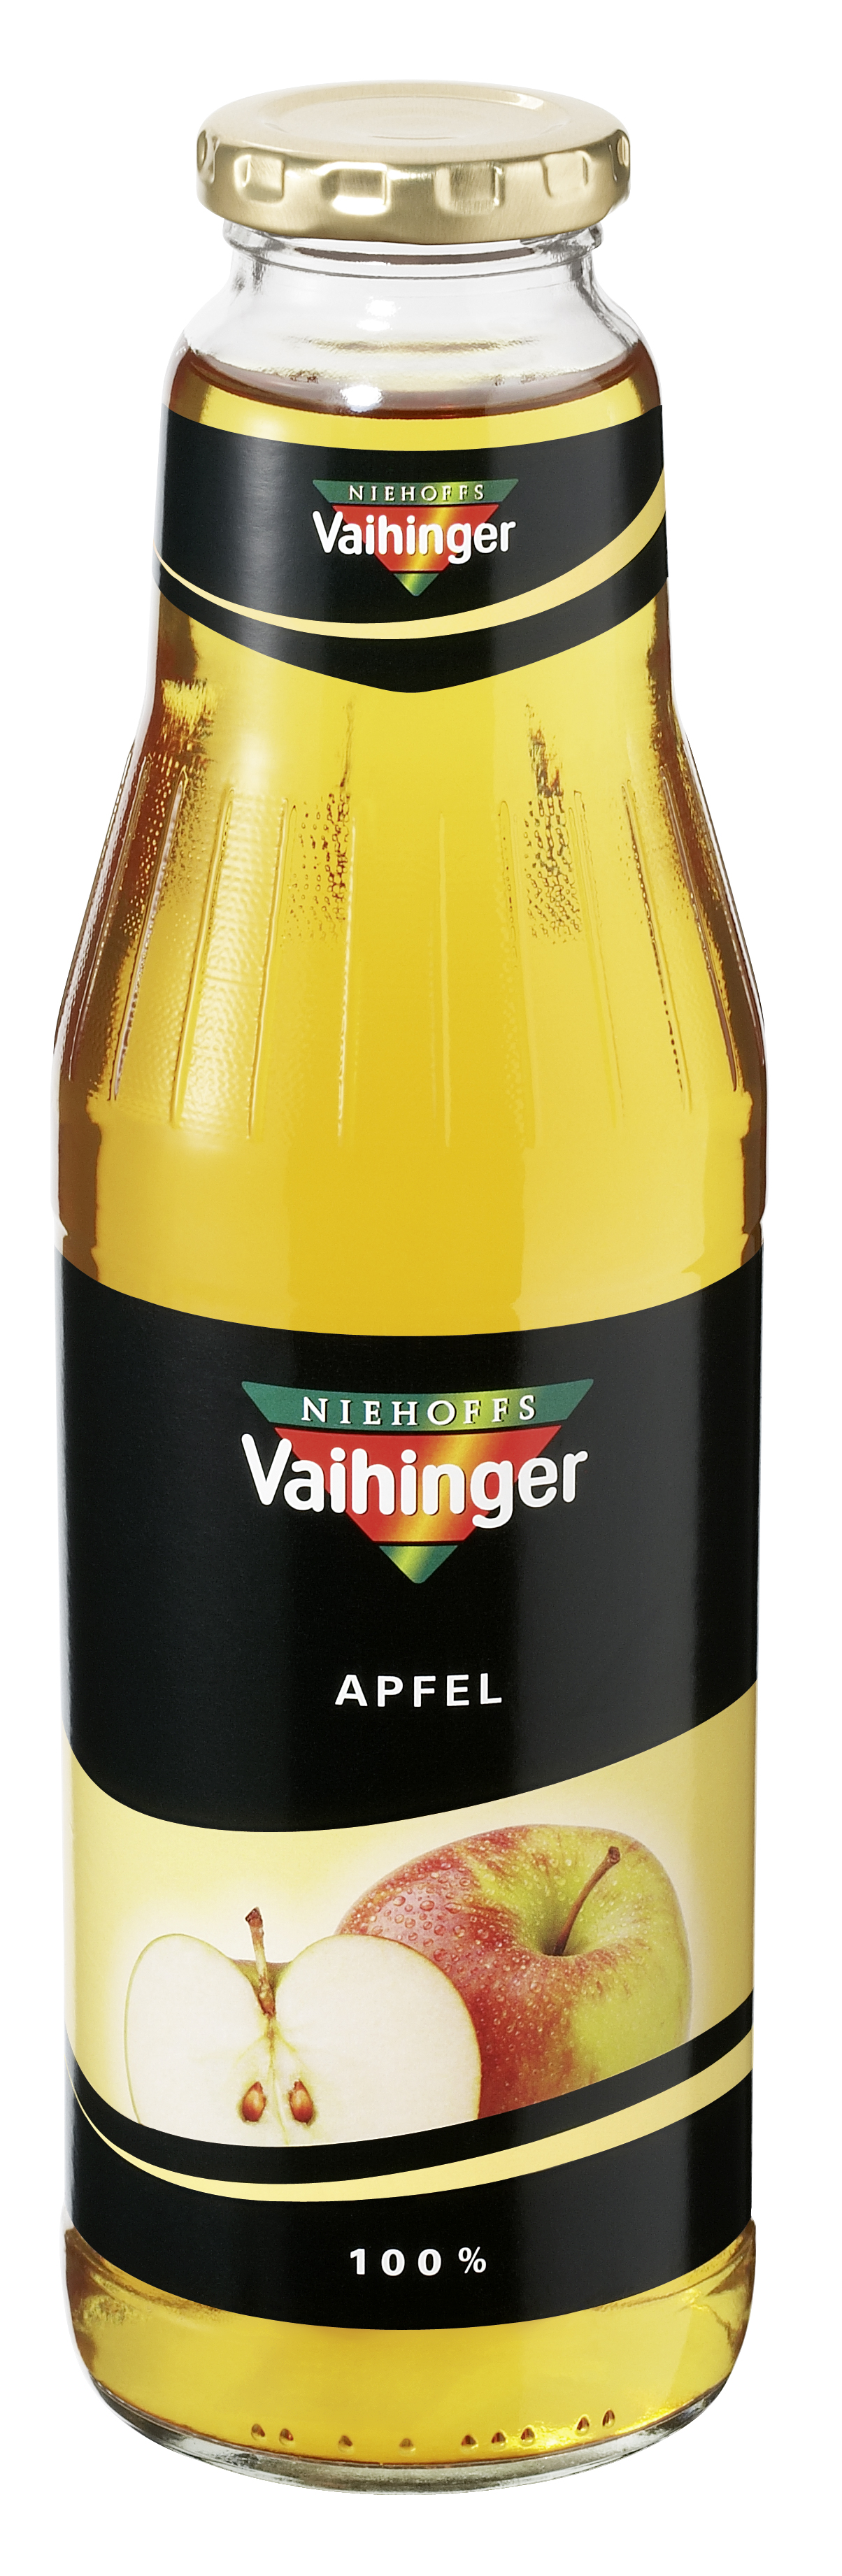 Apfelsaft klar/trüb Image